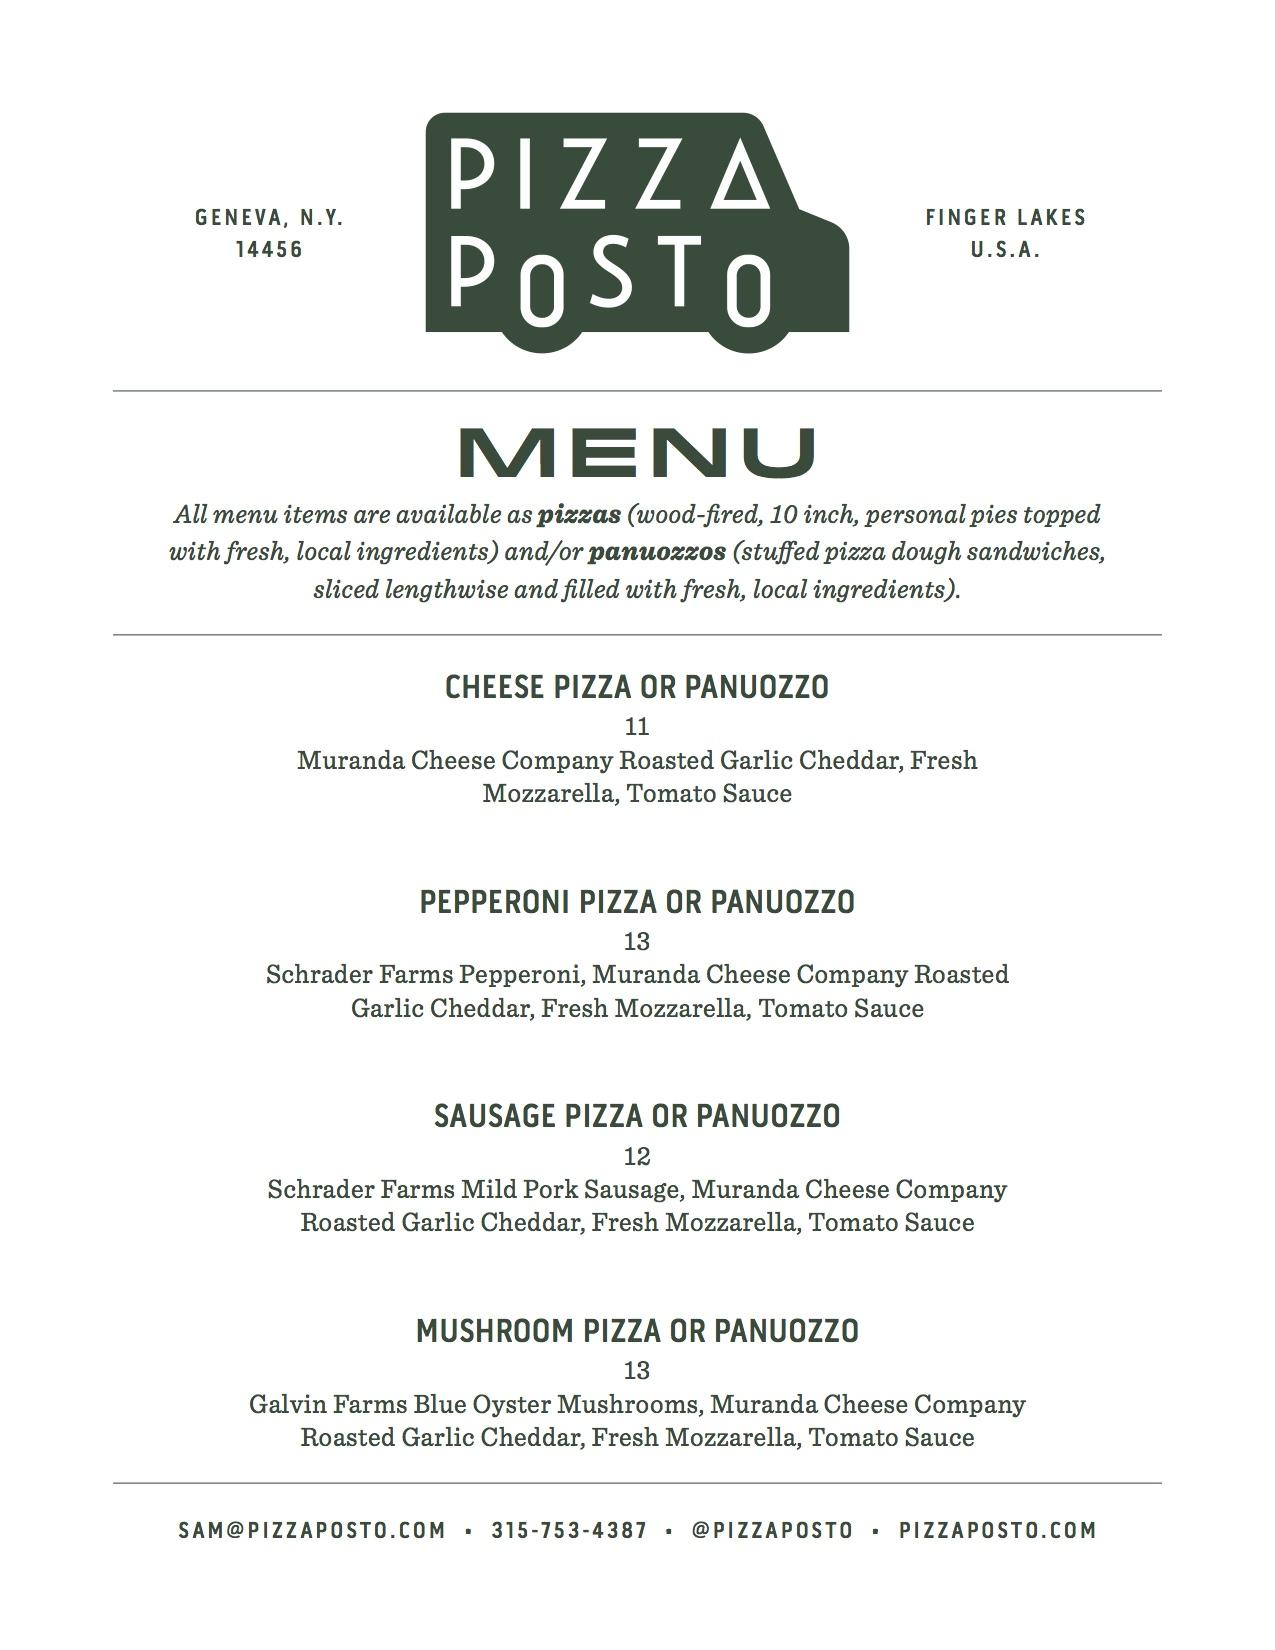 PizzaPosto_OnePageMenu_Print_V3_Final.jpg